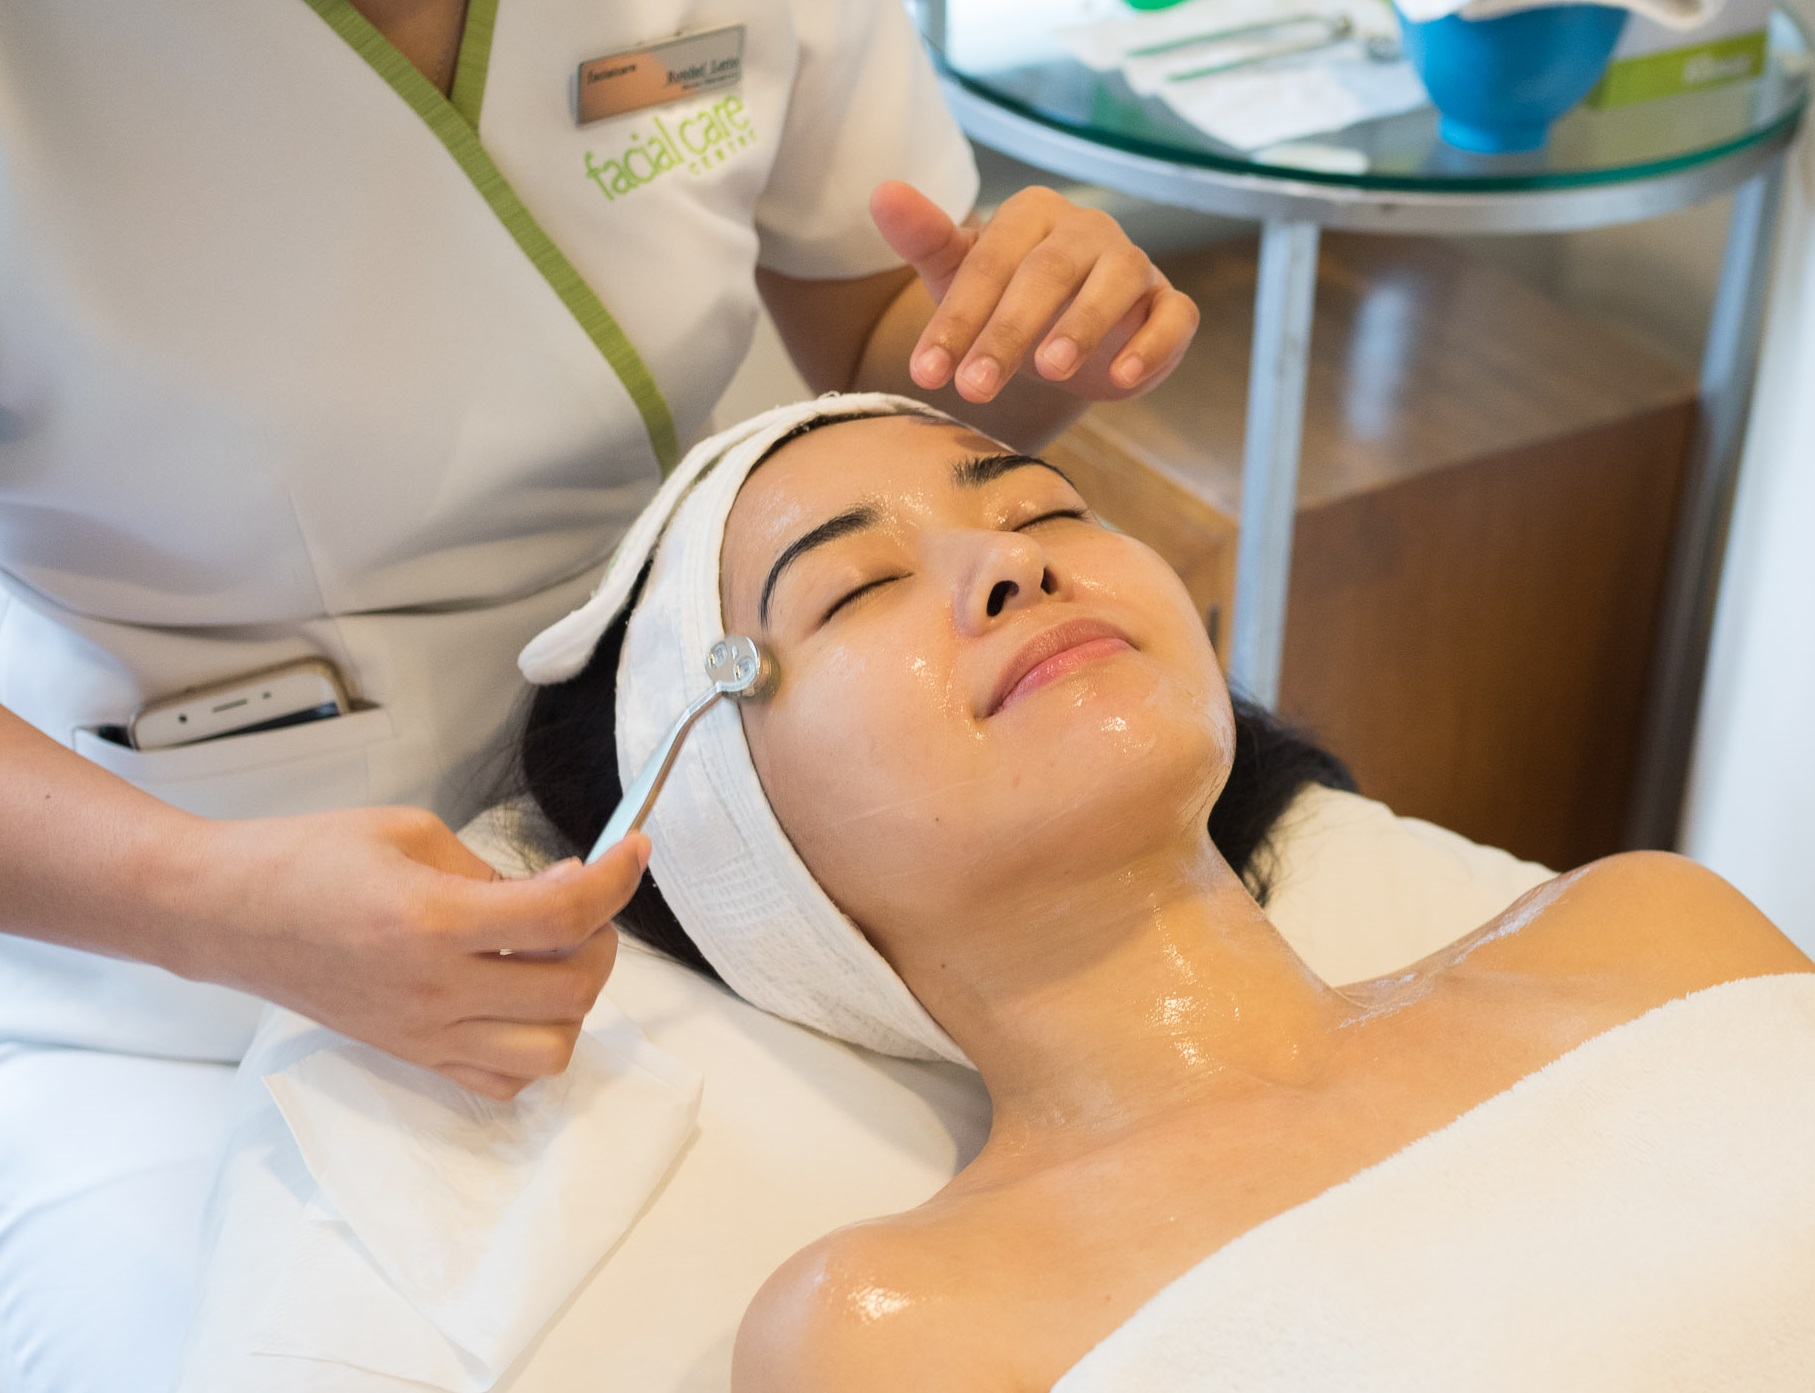 PunjabKesari, Anti Aging Tips Image, Skin Care Tips, Beauty Secrets Image